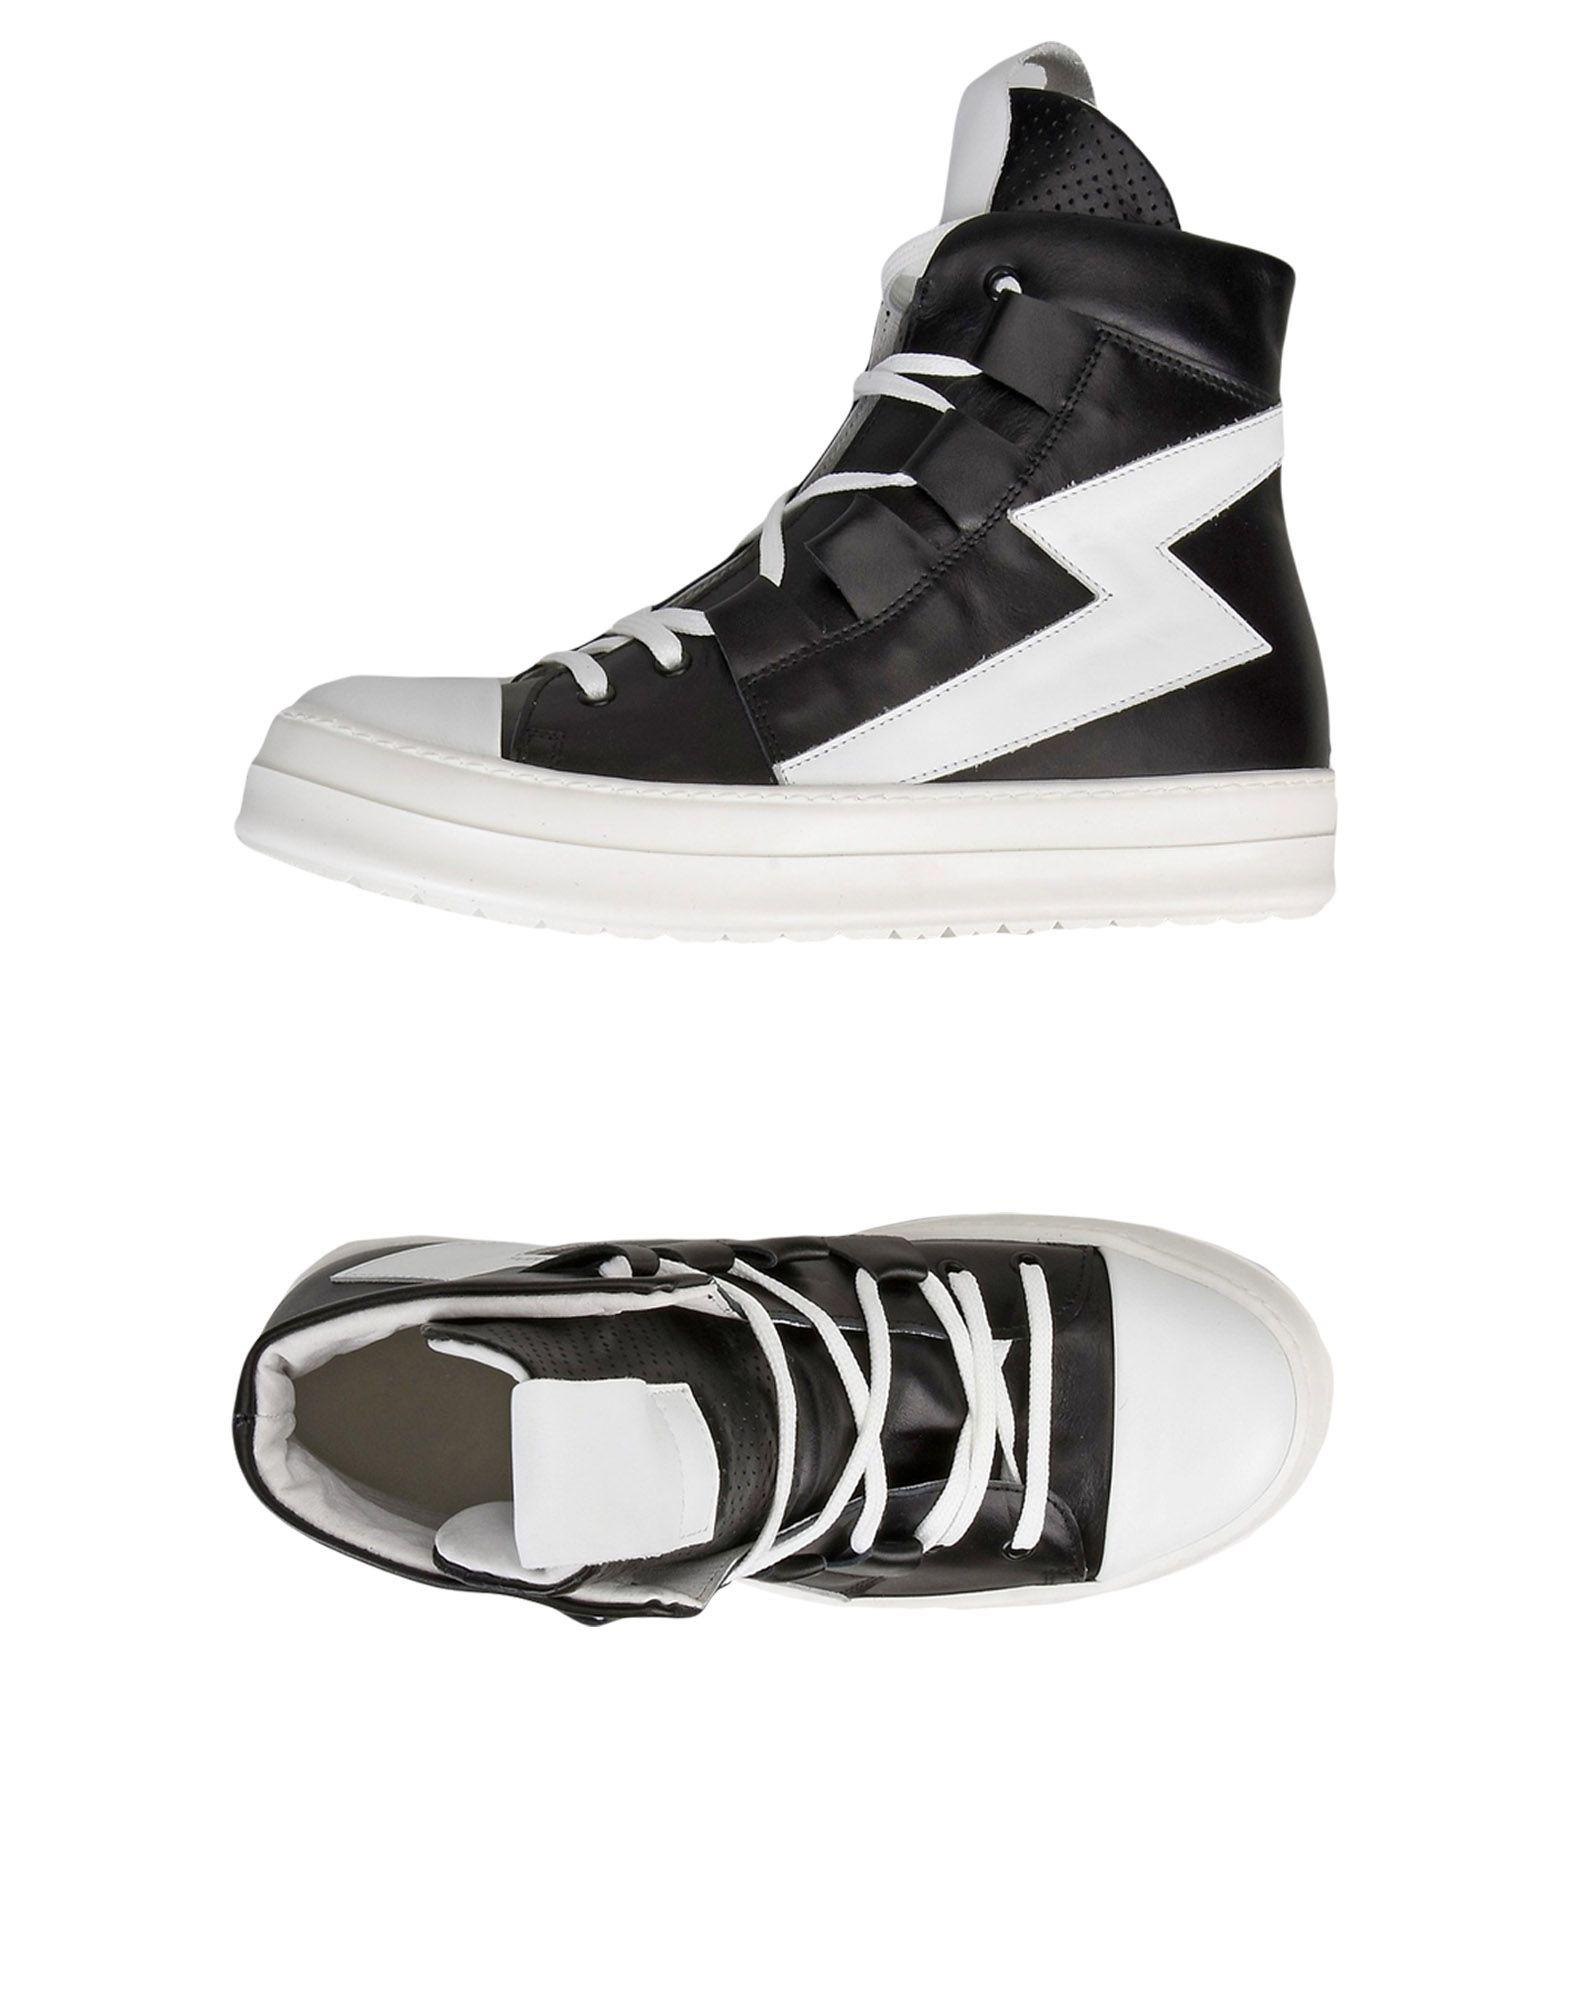 PIERRE DARRÉ Sneakers 2015 online eQCFdzmSqn